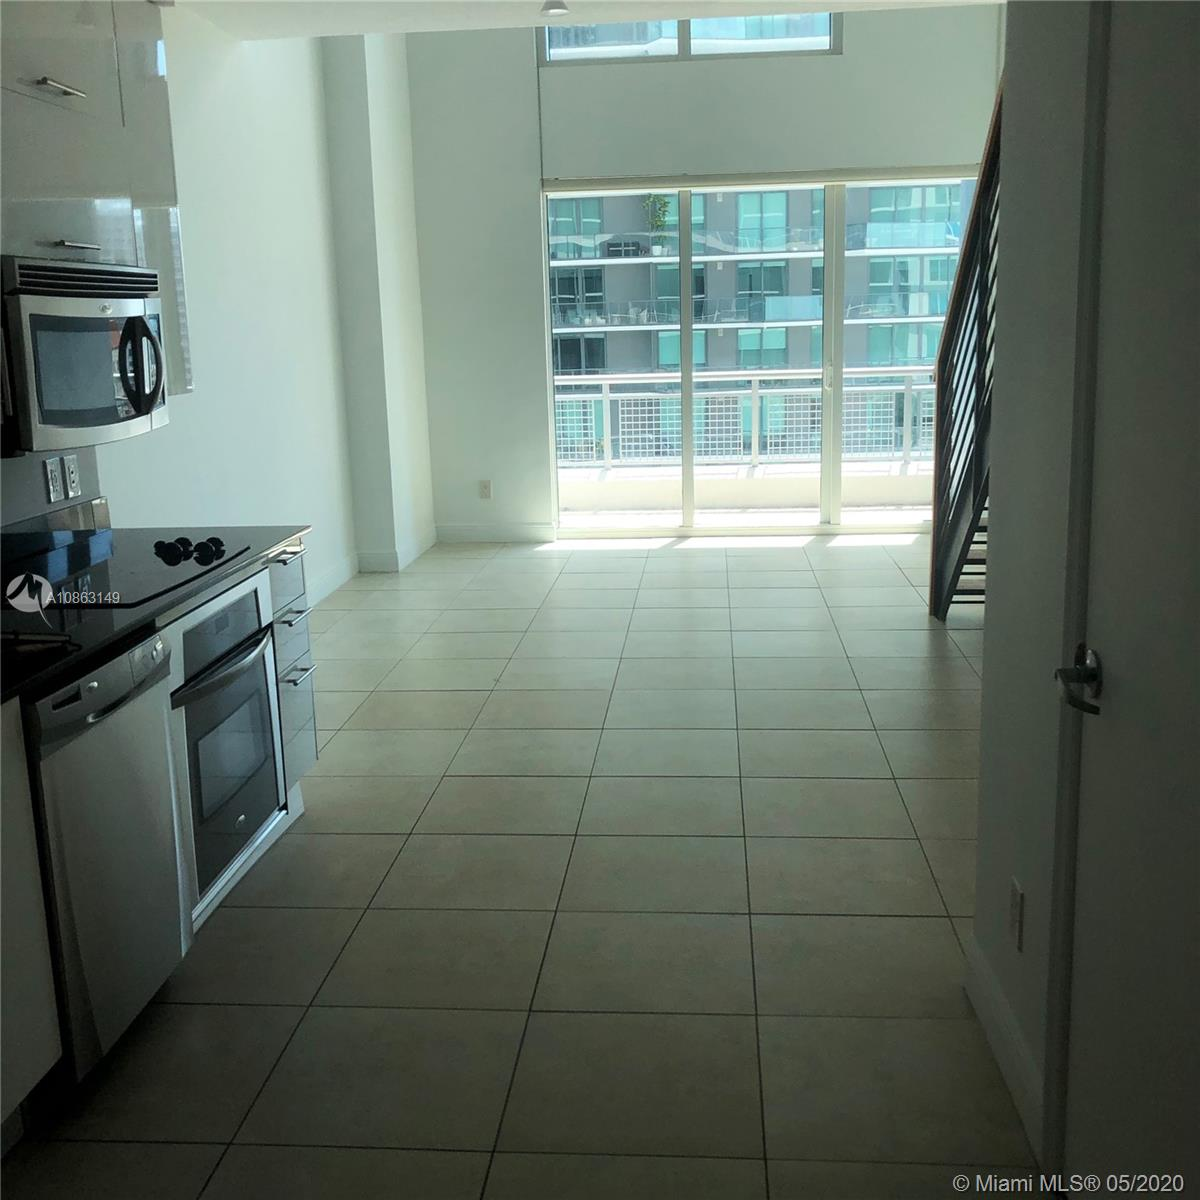 Infinity at Brickell #1608 - 60 SW 13th St #1608, Miami, FL 33130